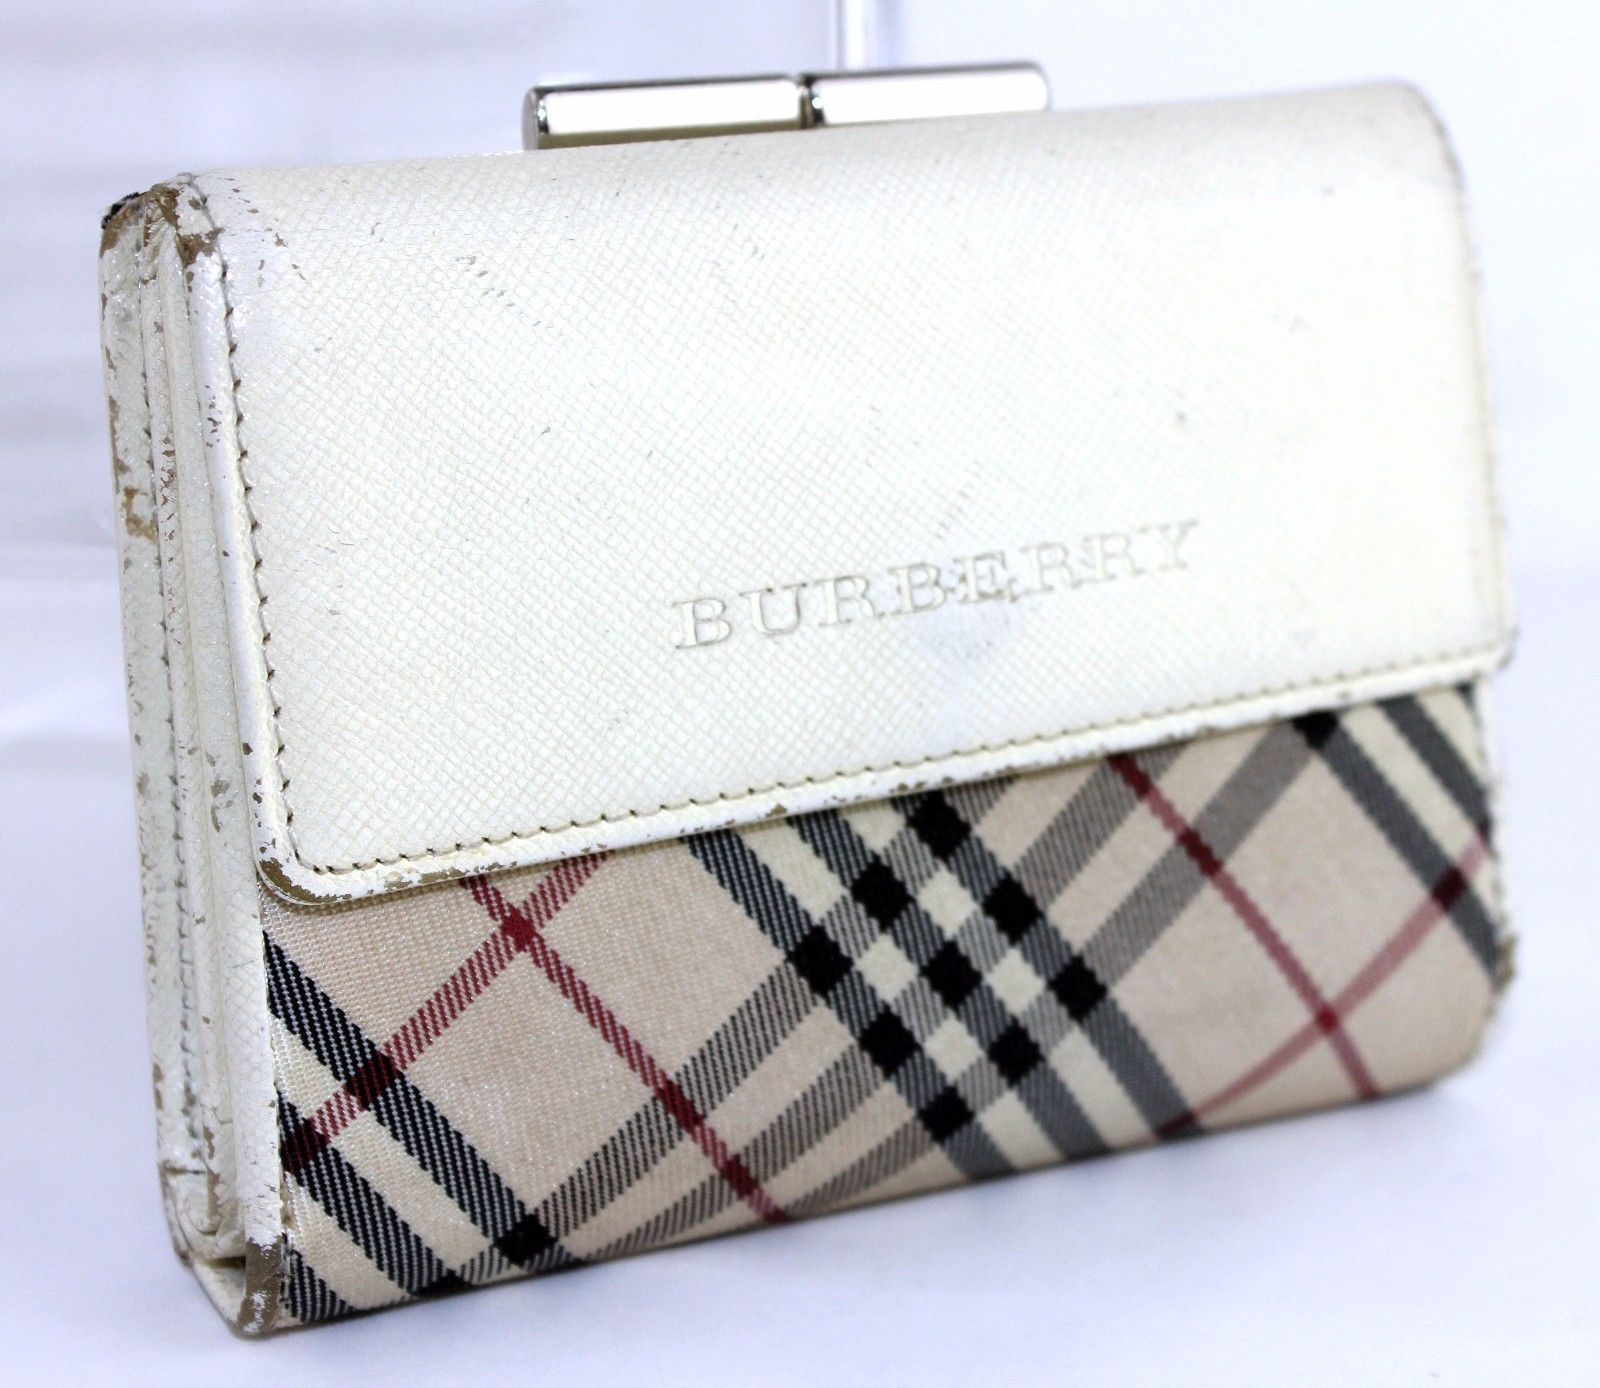 7e072633da71 S l1600. S l1600. Previous. 100% Authentic Burberry London Beige Nova Check  Fabric Leather Bi-fold Wallet